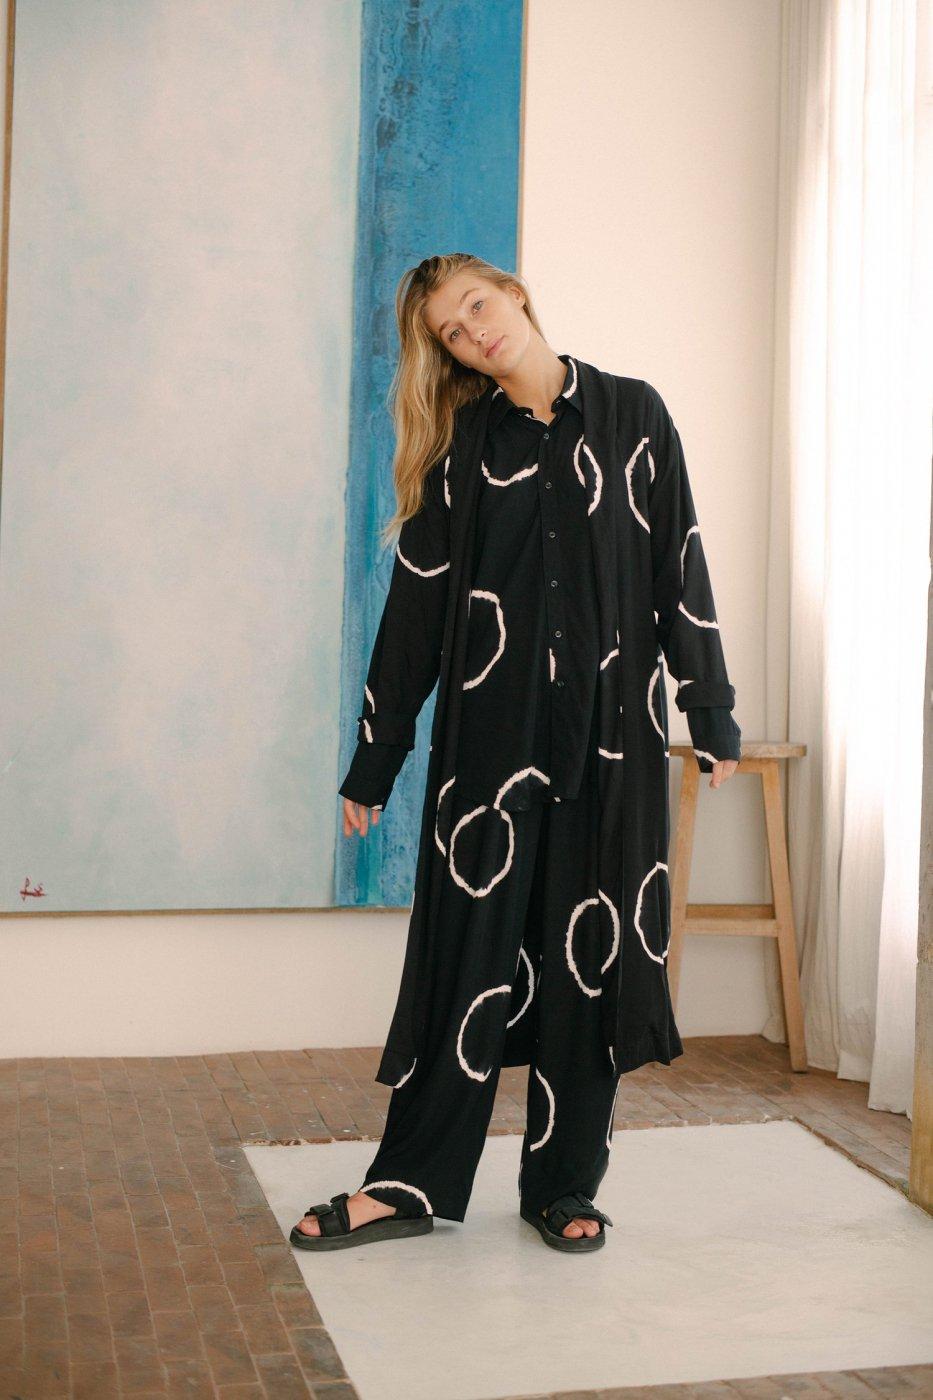 SUKU HOME スクホーム-DRESSING GOWN-MOON